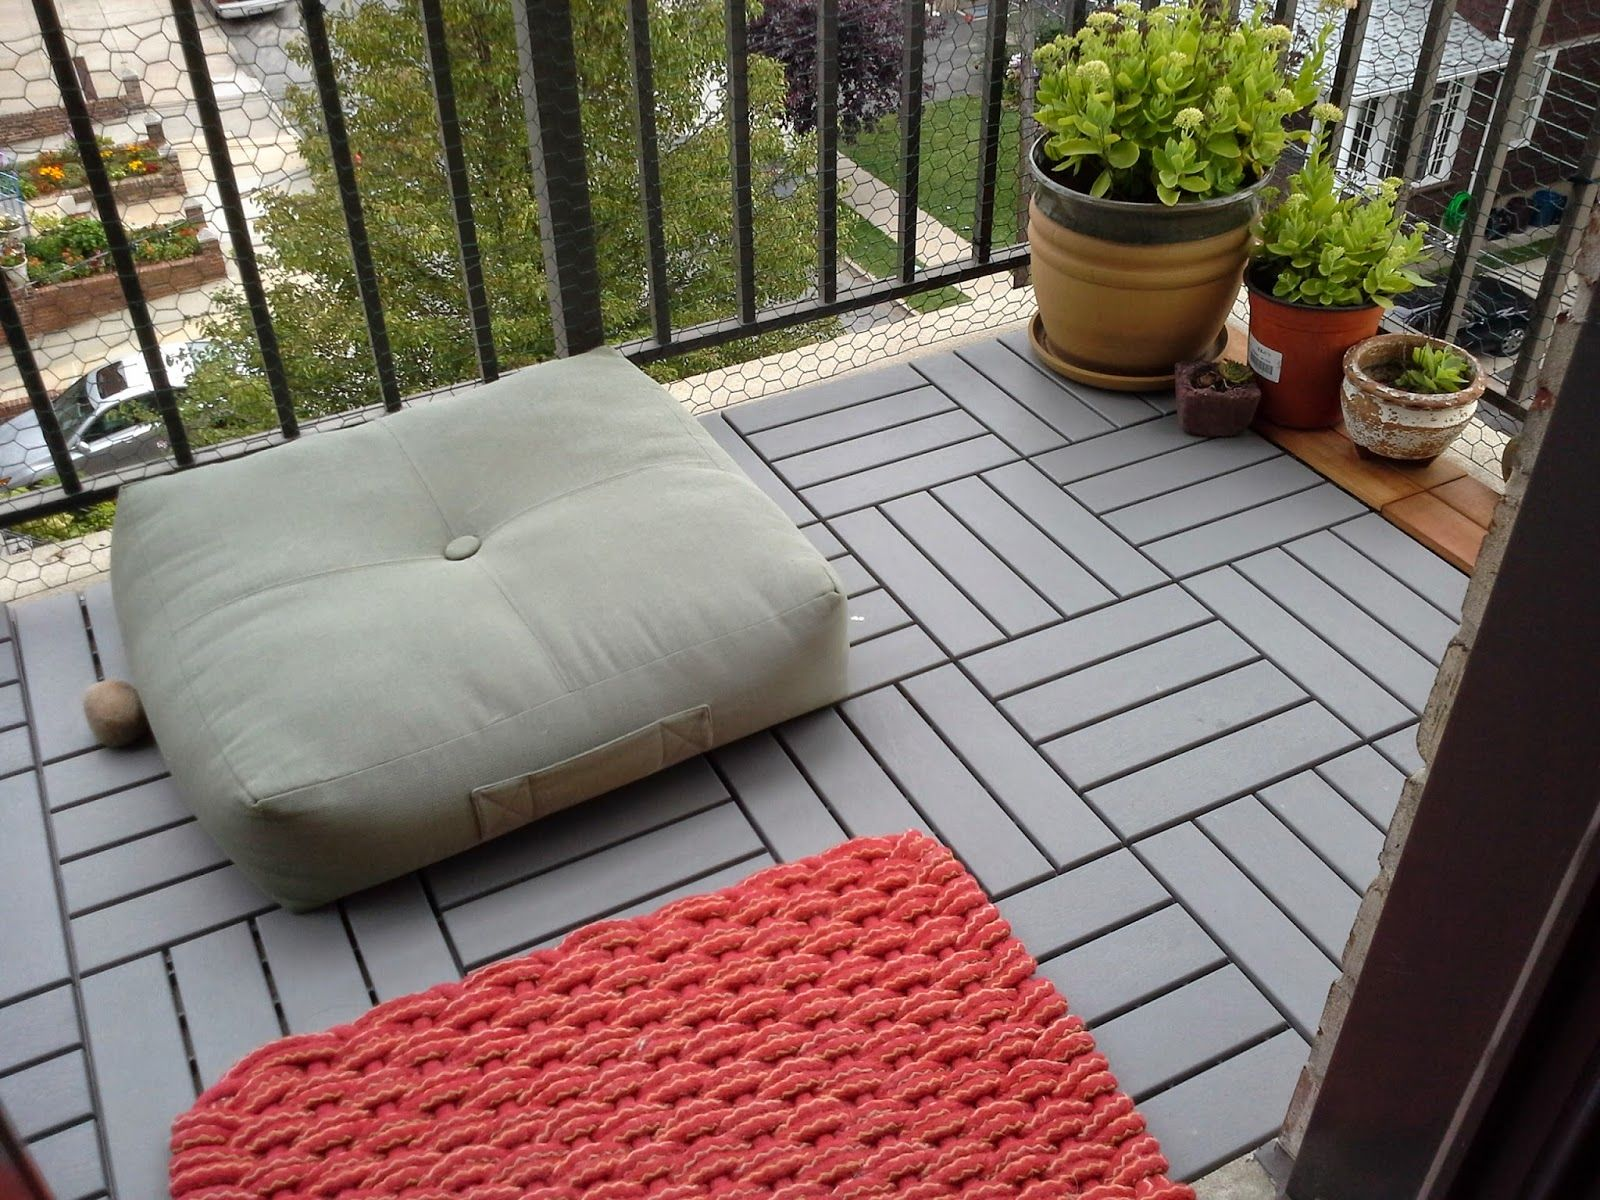 Decor your outdoor patio using interlocking deck tiles cool ikea decor your outdoor patio using interlocking deck tiles cool ikea interlocking deck tiles and floor doublecrazyfo Choice Image